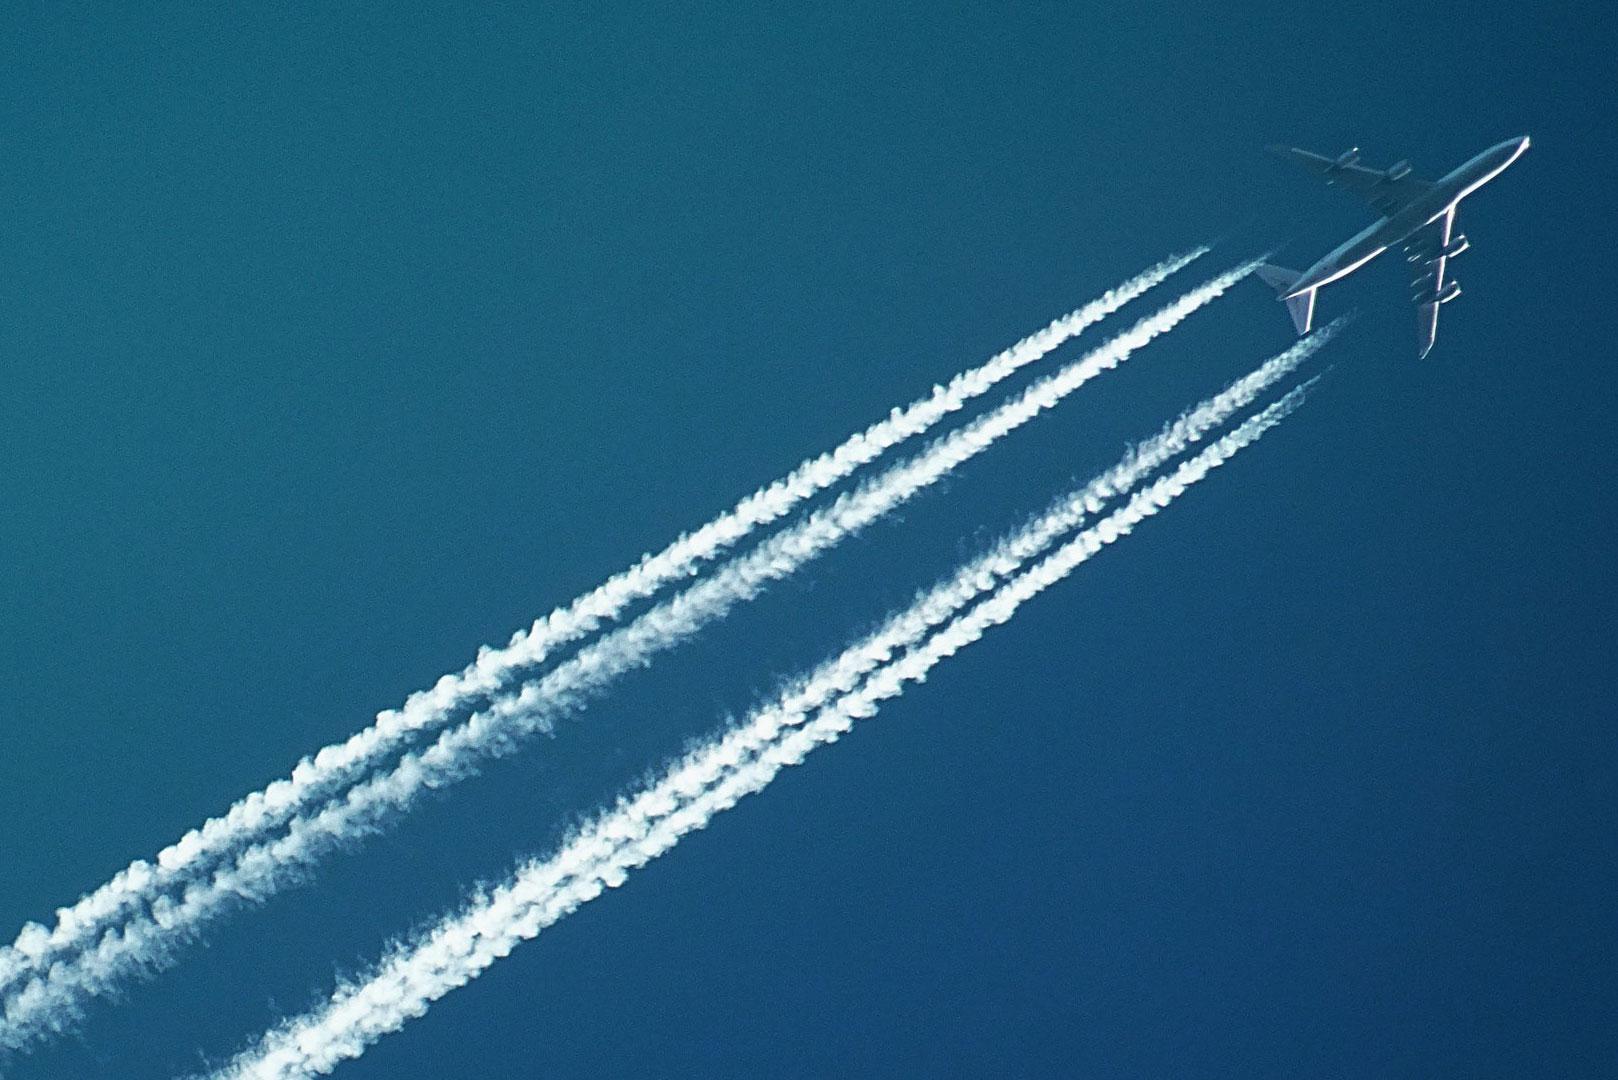 Avion à pleine altitude